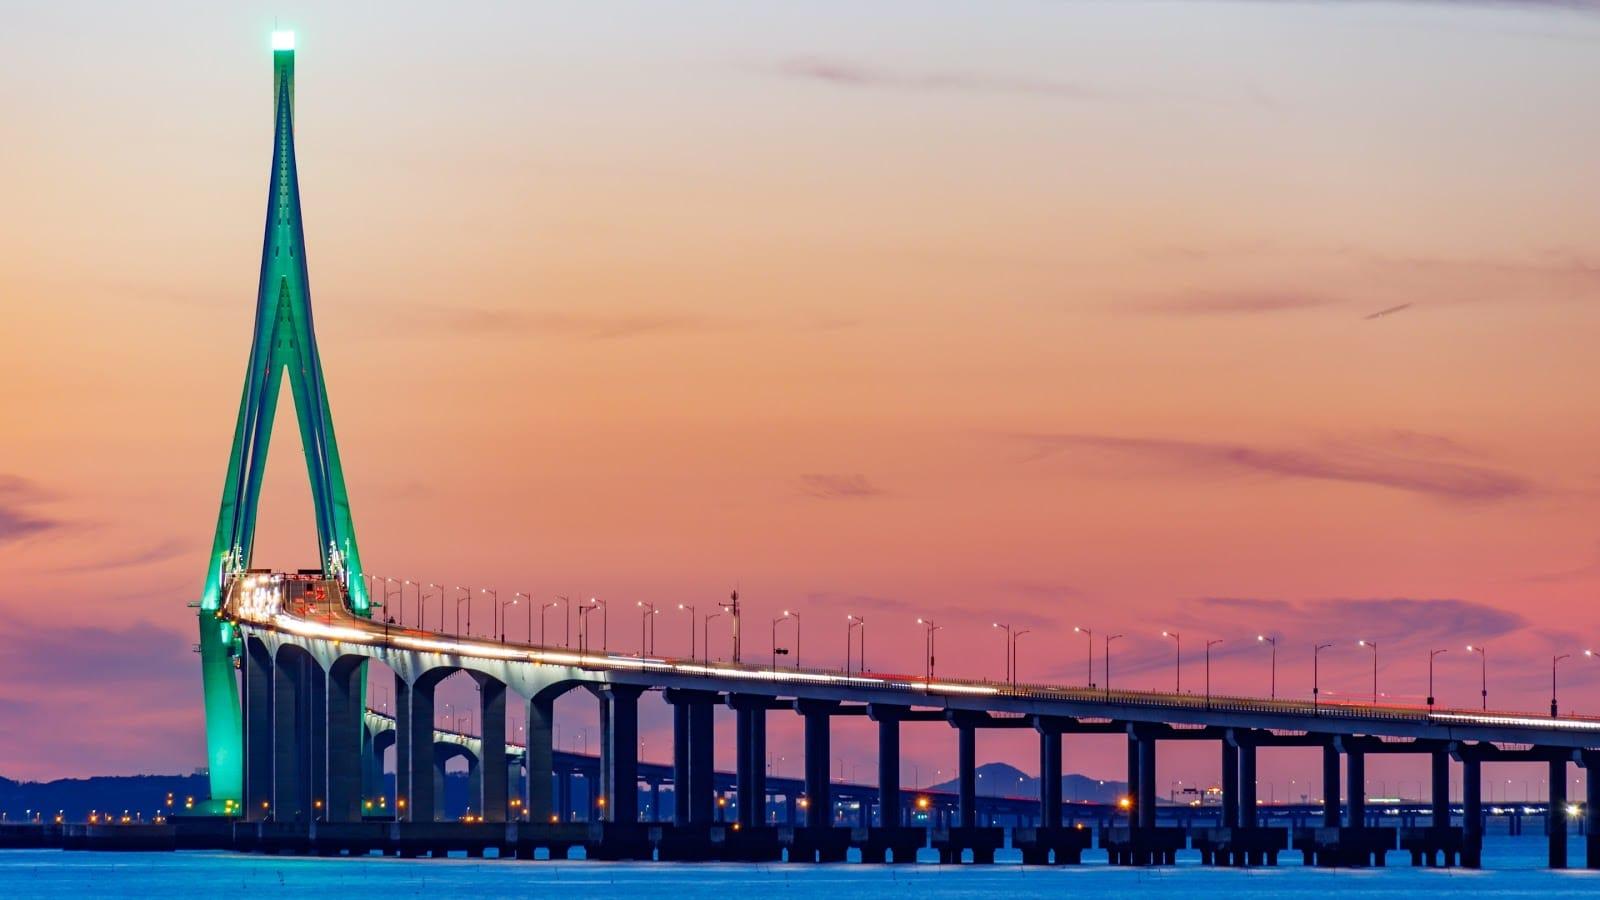 The bridge to Incheon Airport